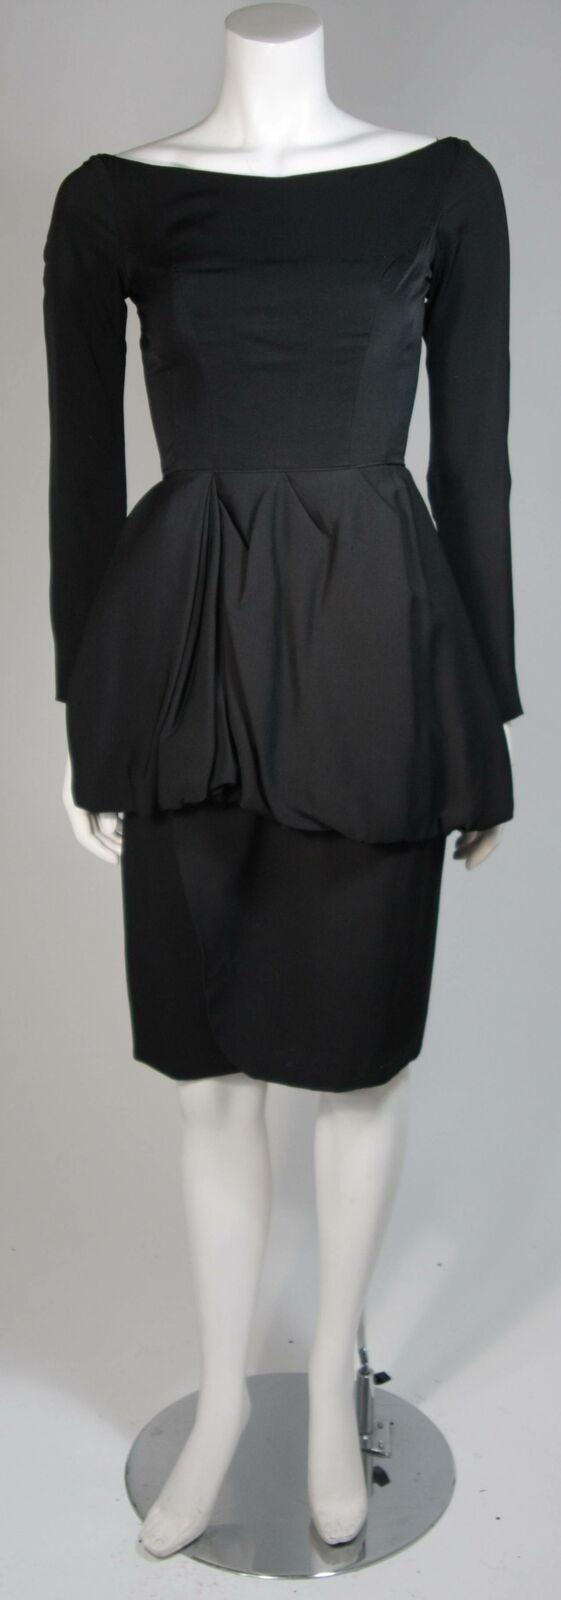 CEIL CHAPMAN Black Draped Princess Style Waist Dr… - image 2